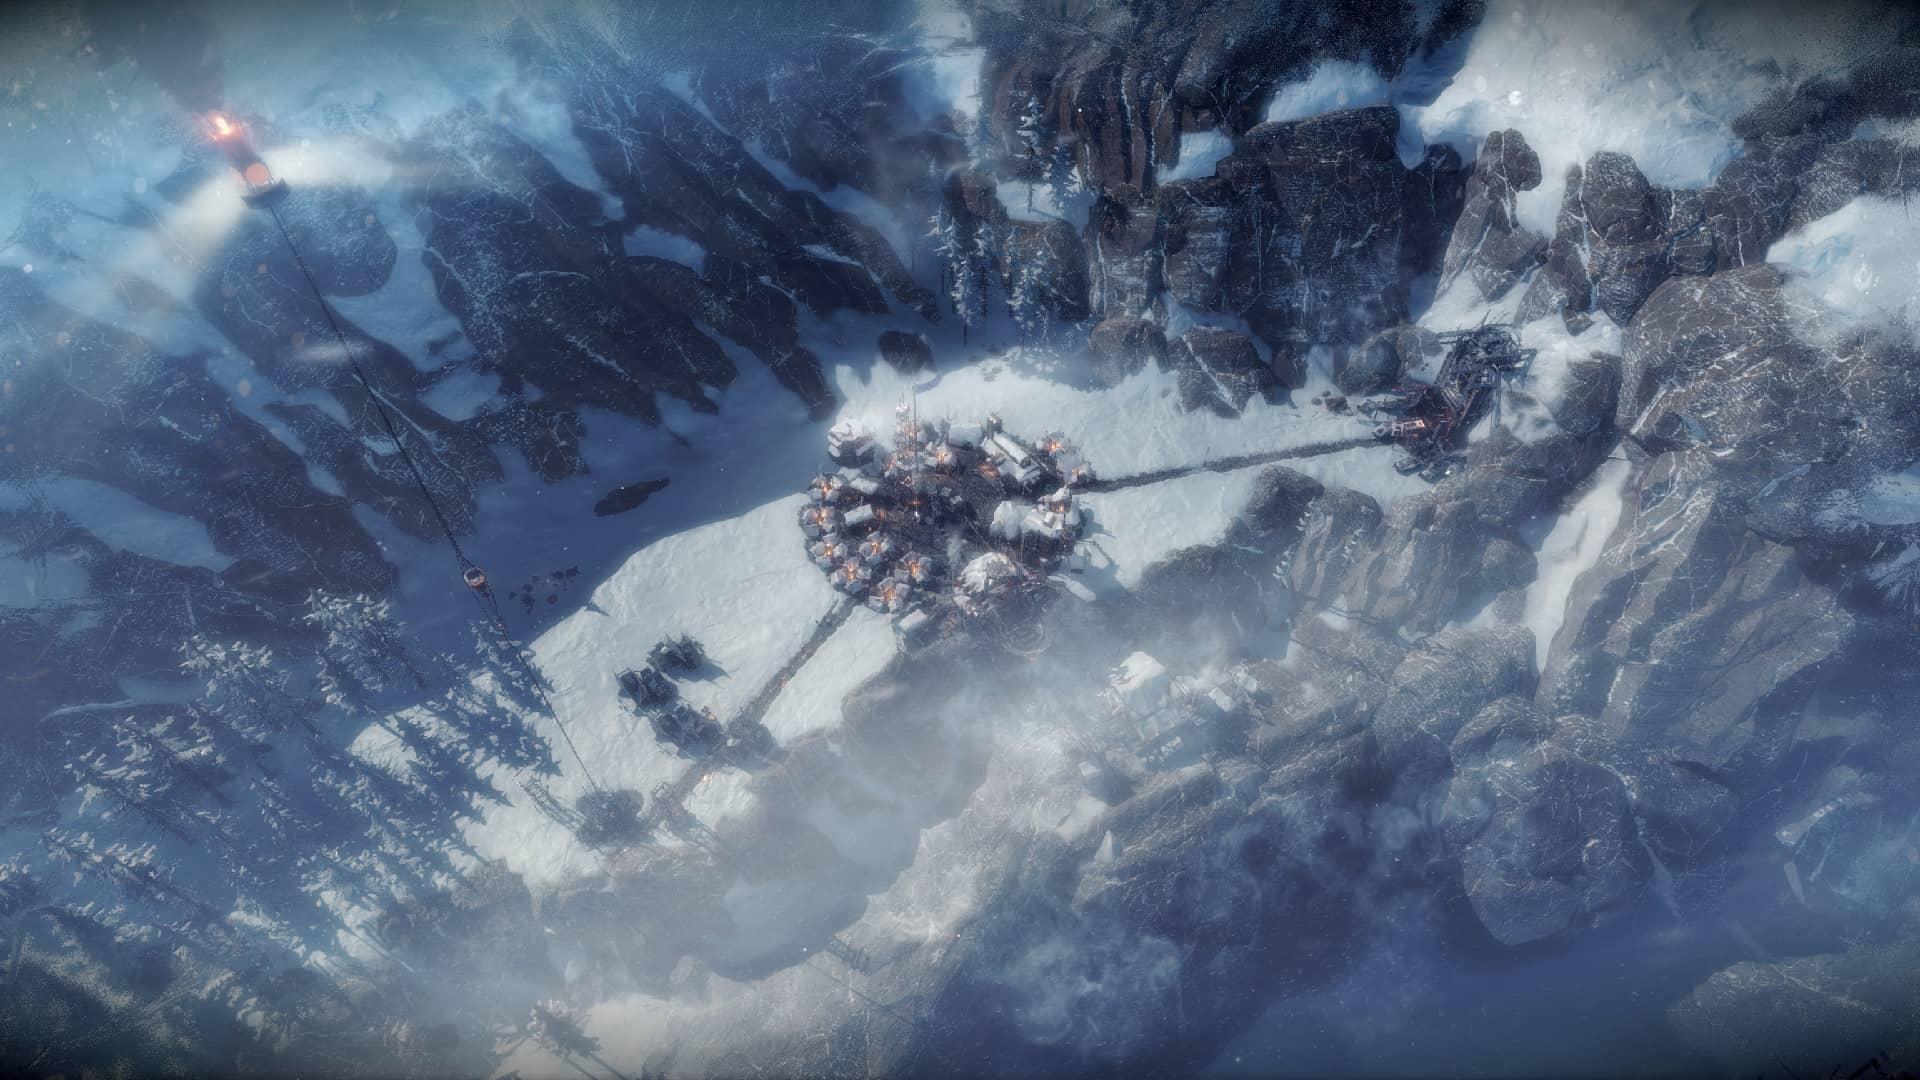 Frostpunk: On The Edge 2